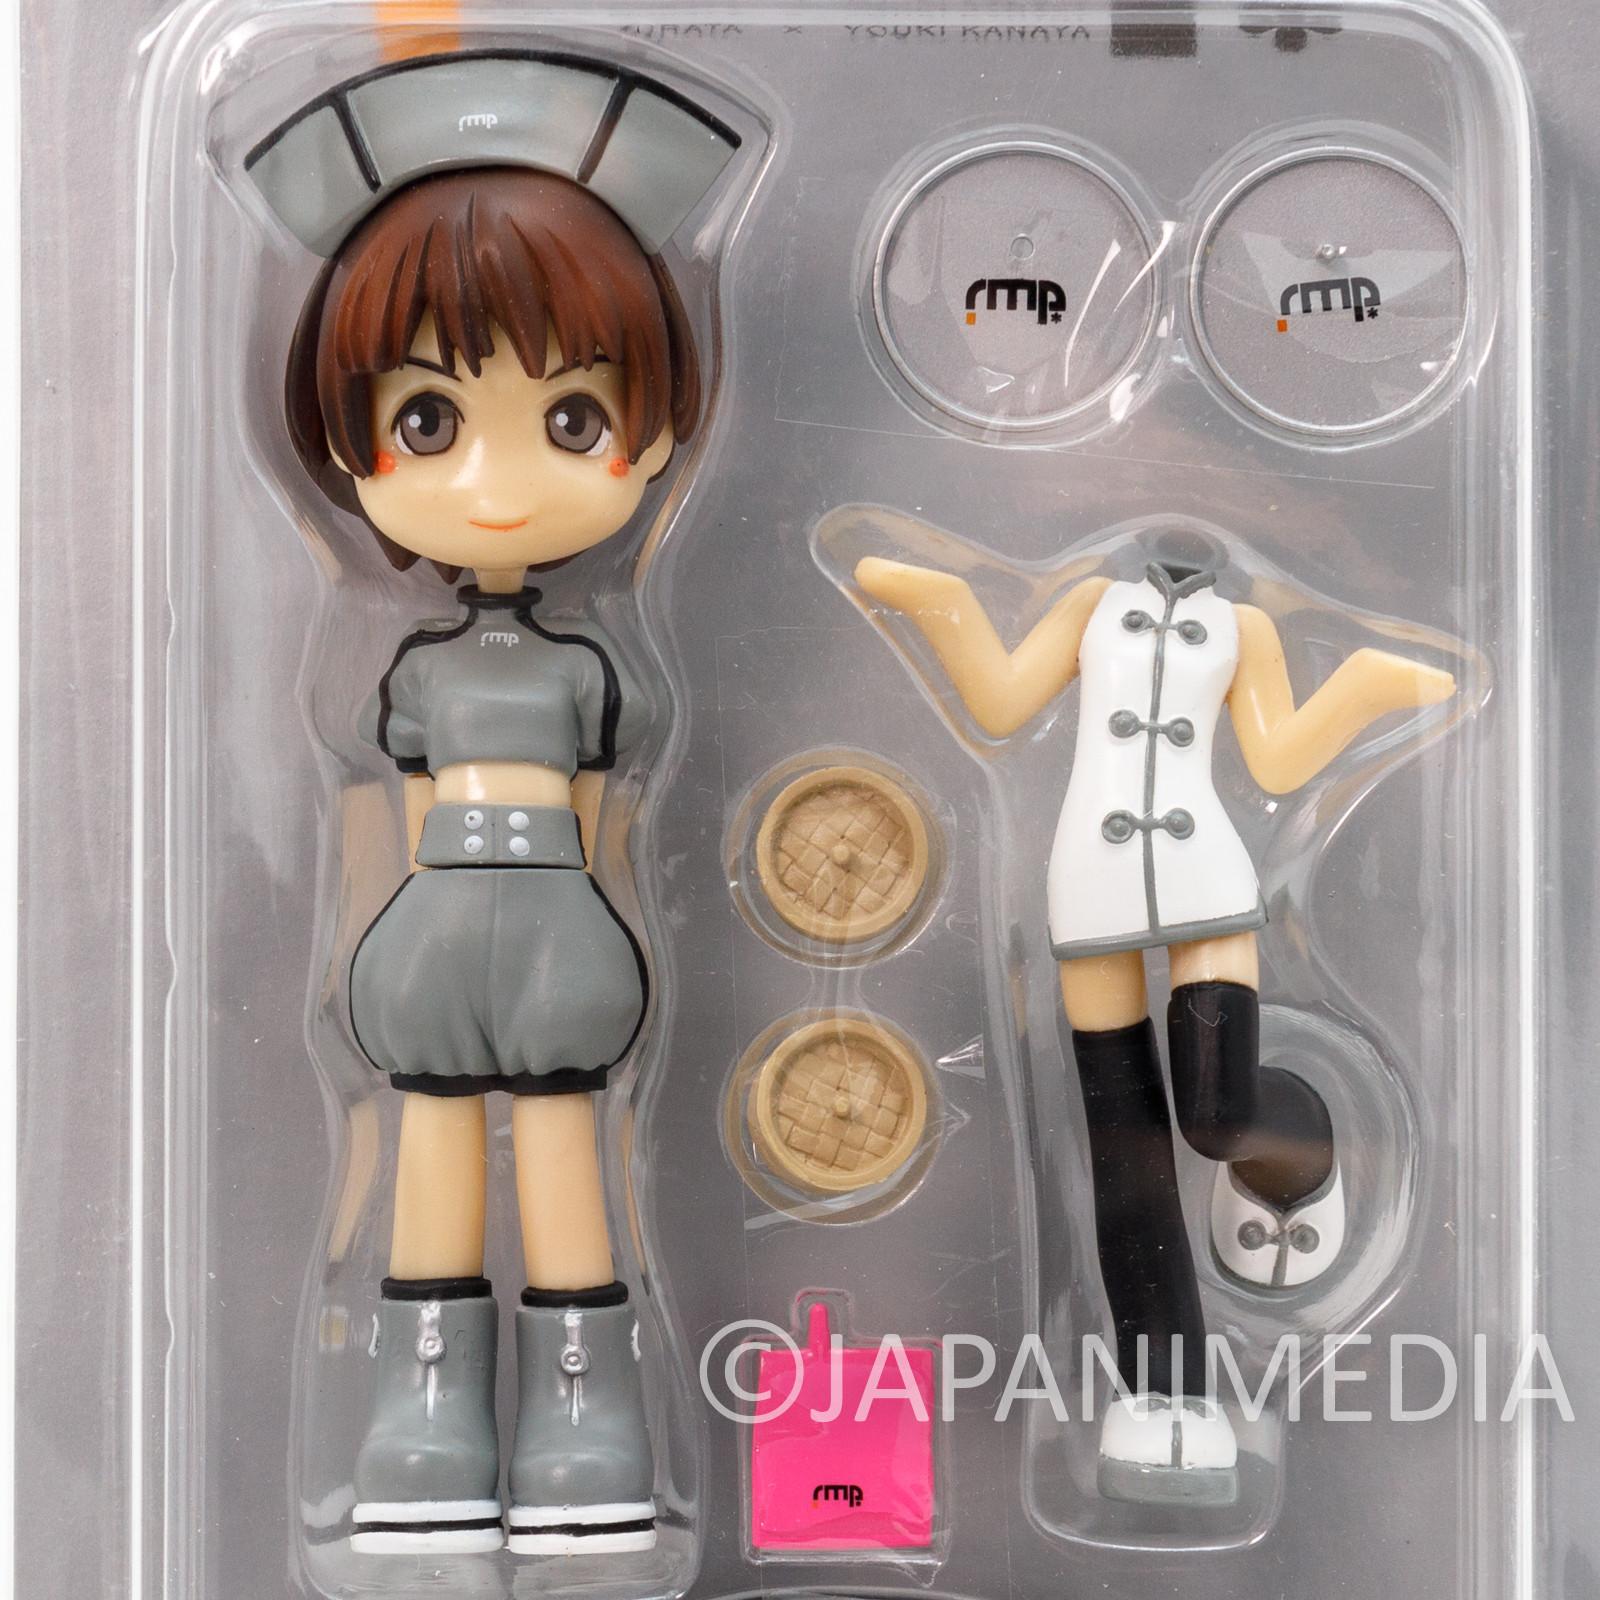 rmp001 Nazuna Pinky Street Figure Range Murata P:Chara JAPAN ANIME